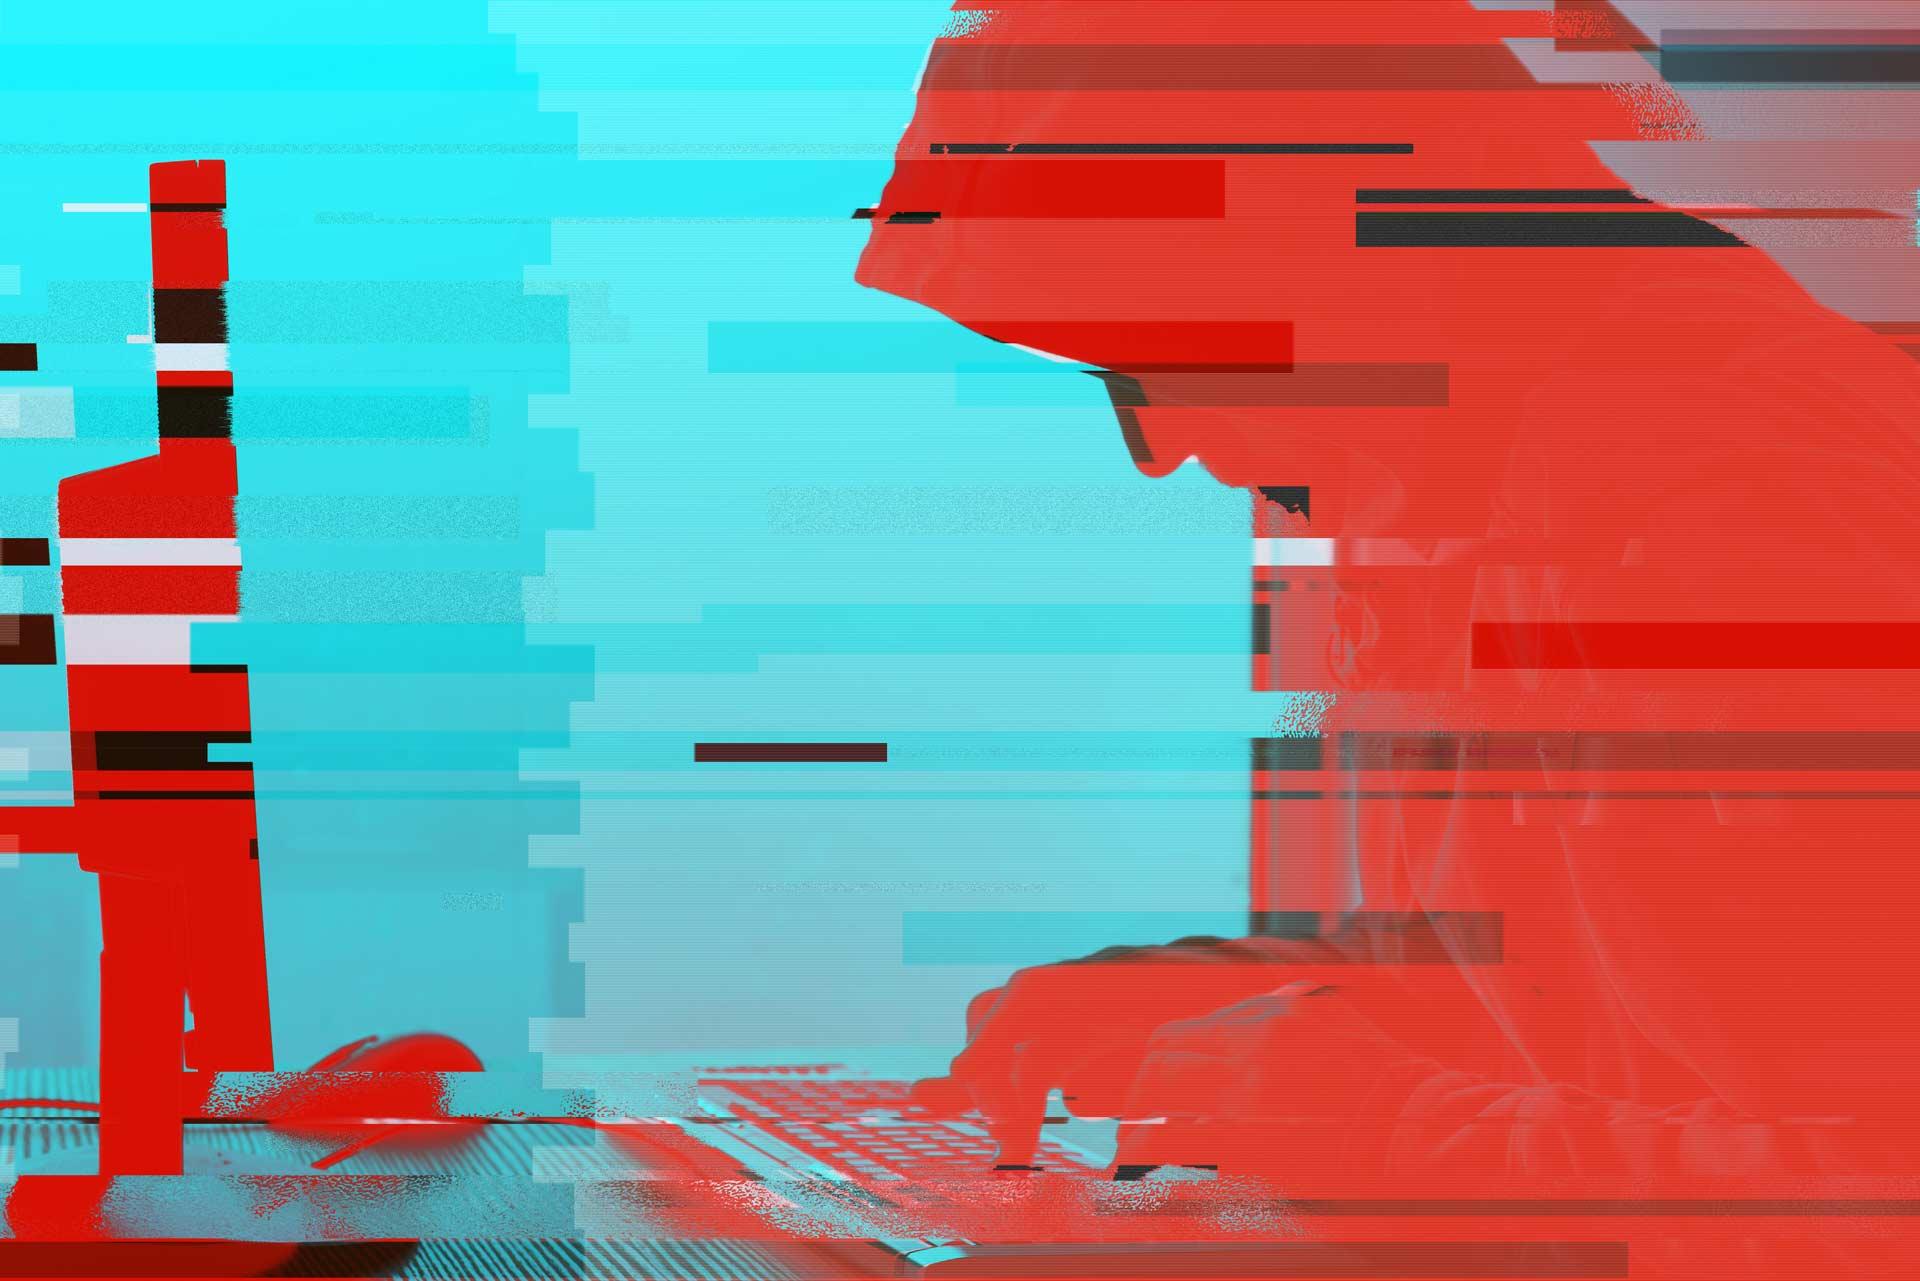 John-Sileo-Cybersecurity-Trends